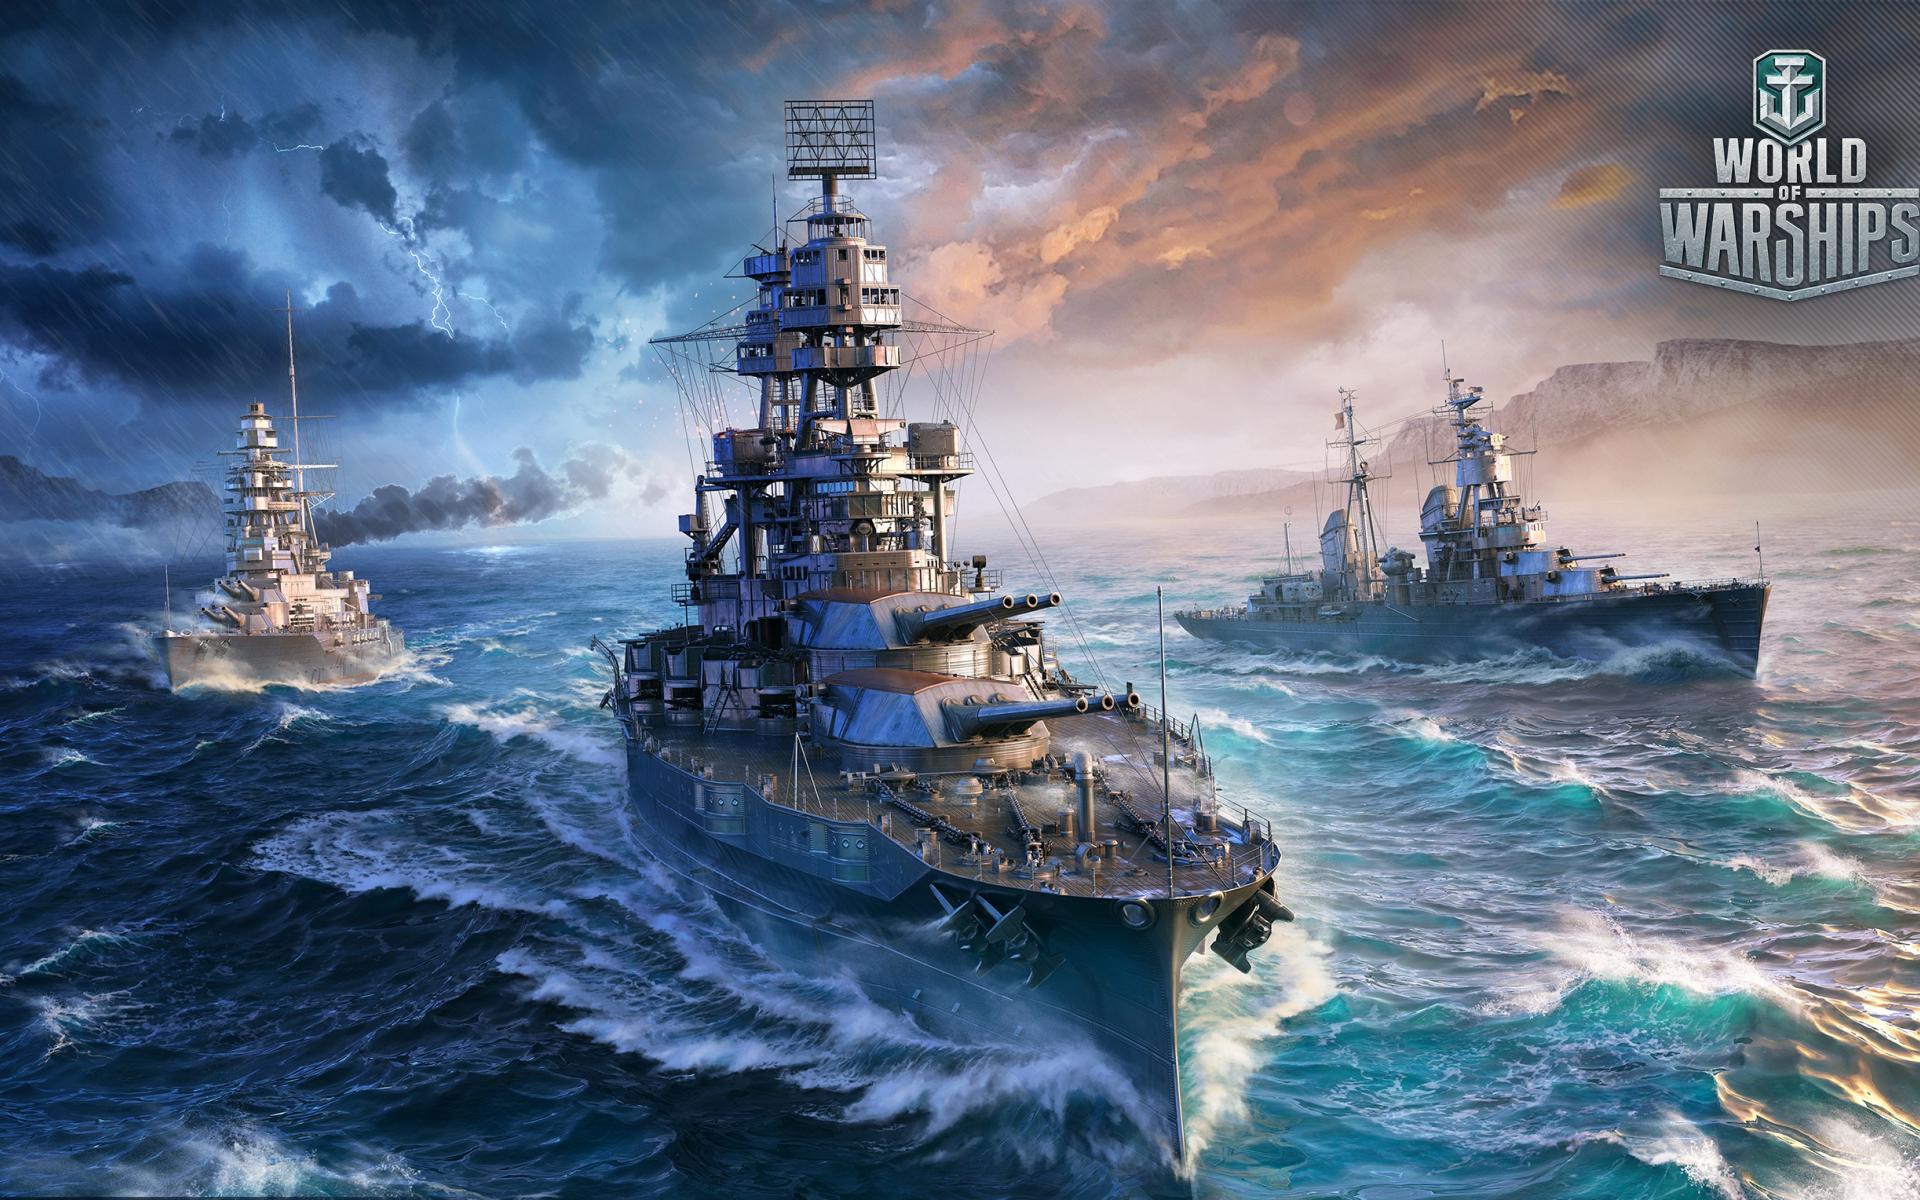 1920x1200 wallpaper World of Warships, 2017 online game, ships